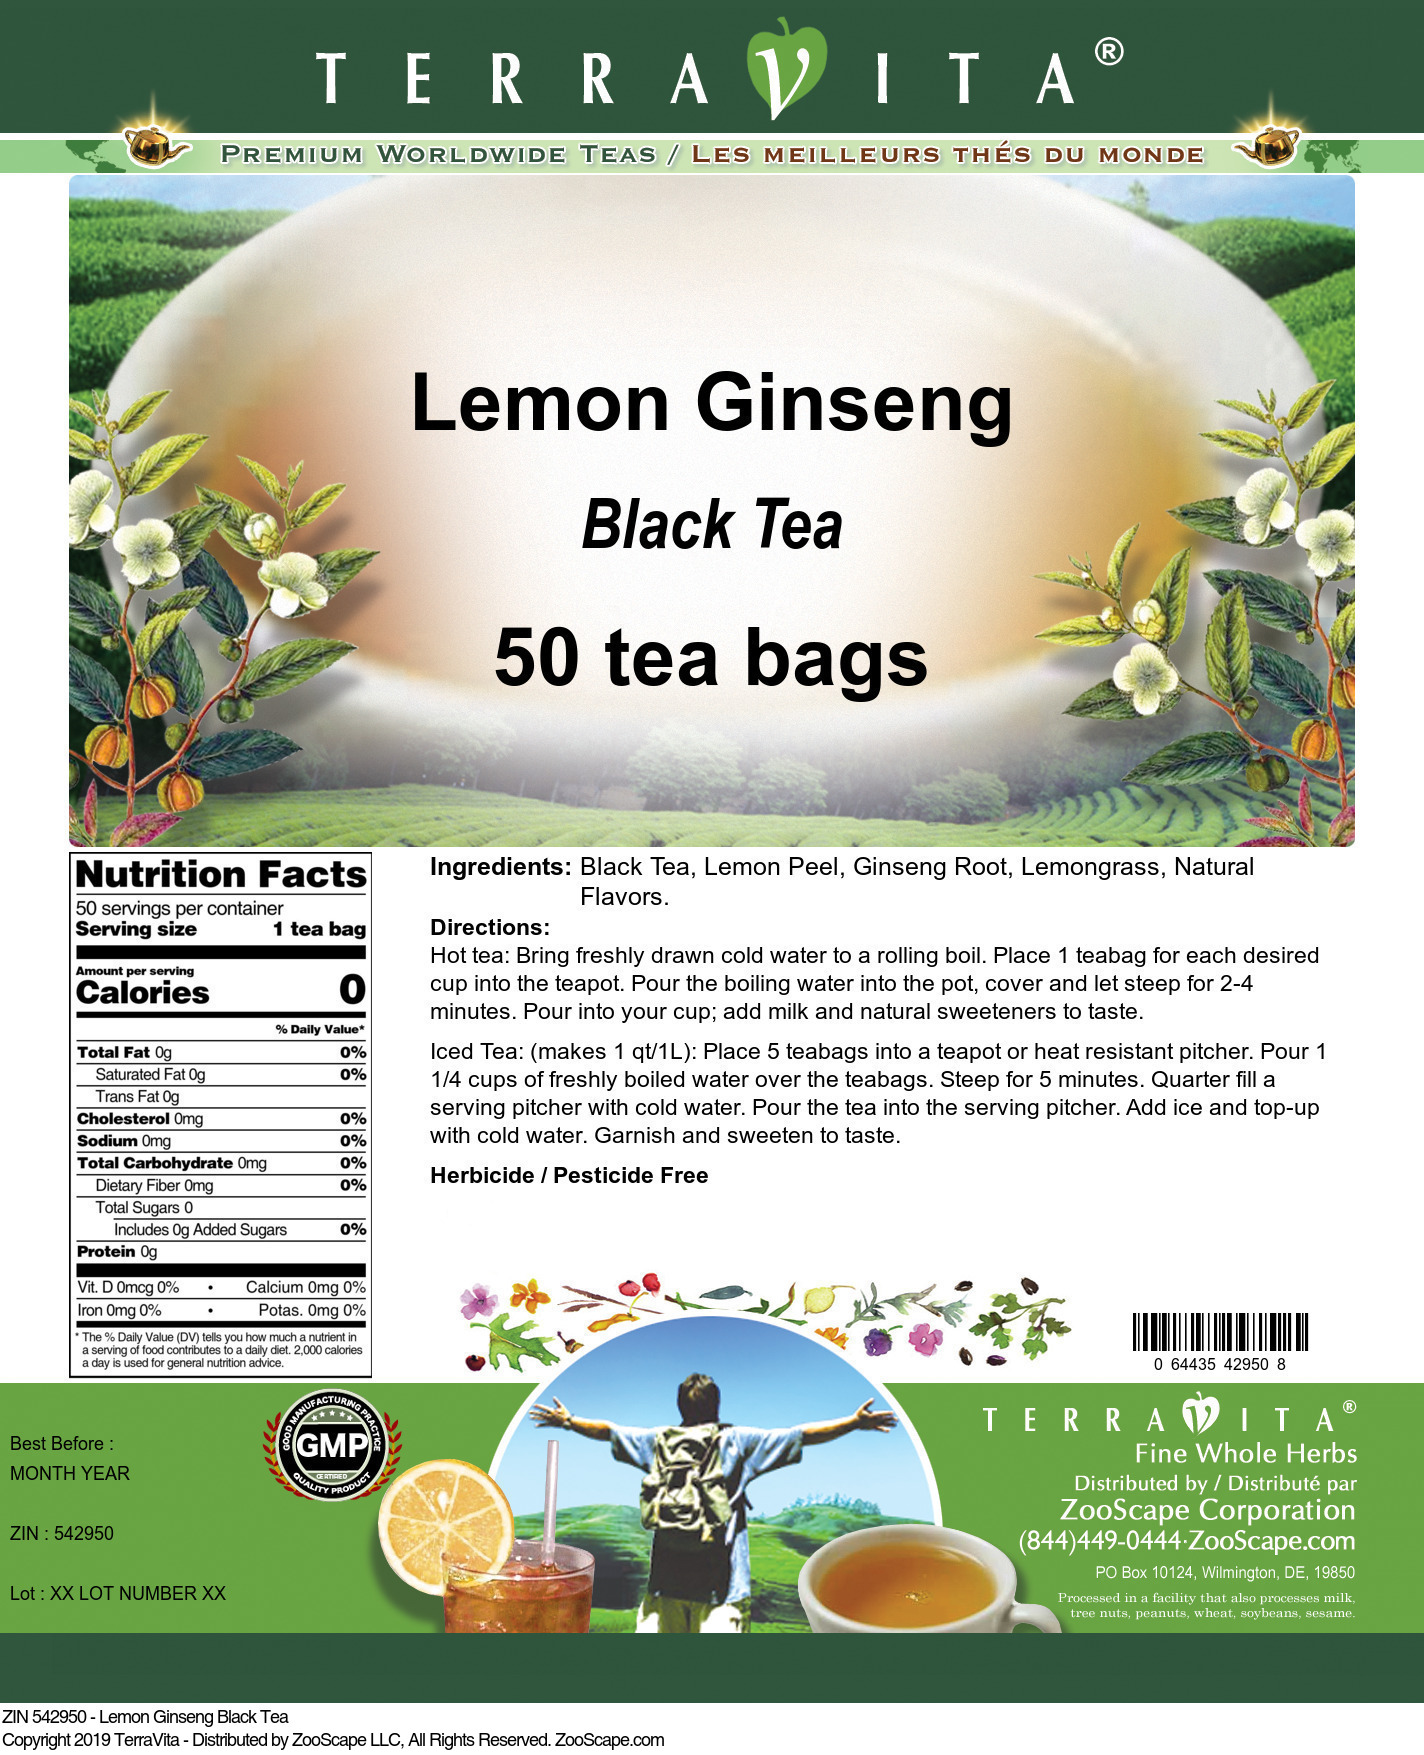 Lemon Ginseng Black Tea